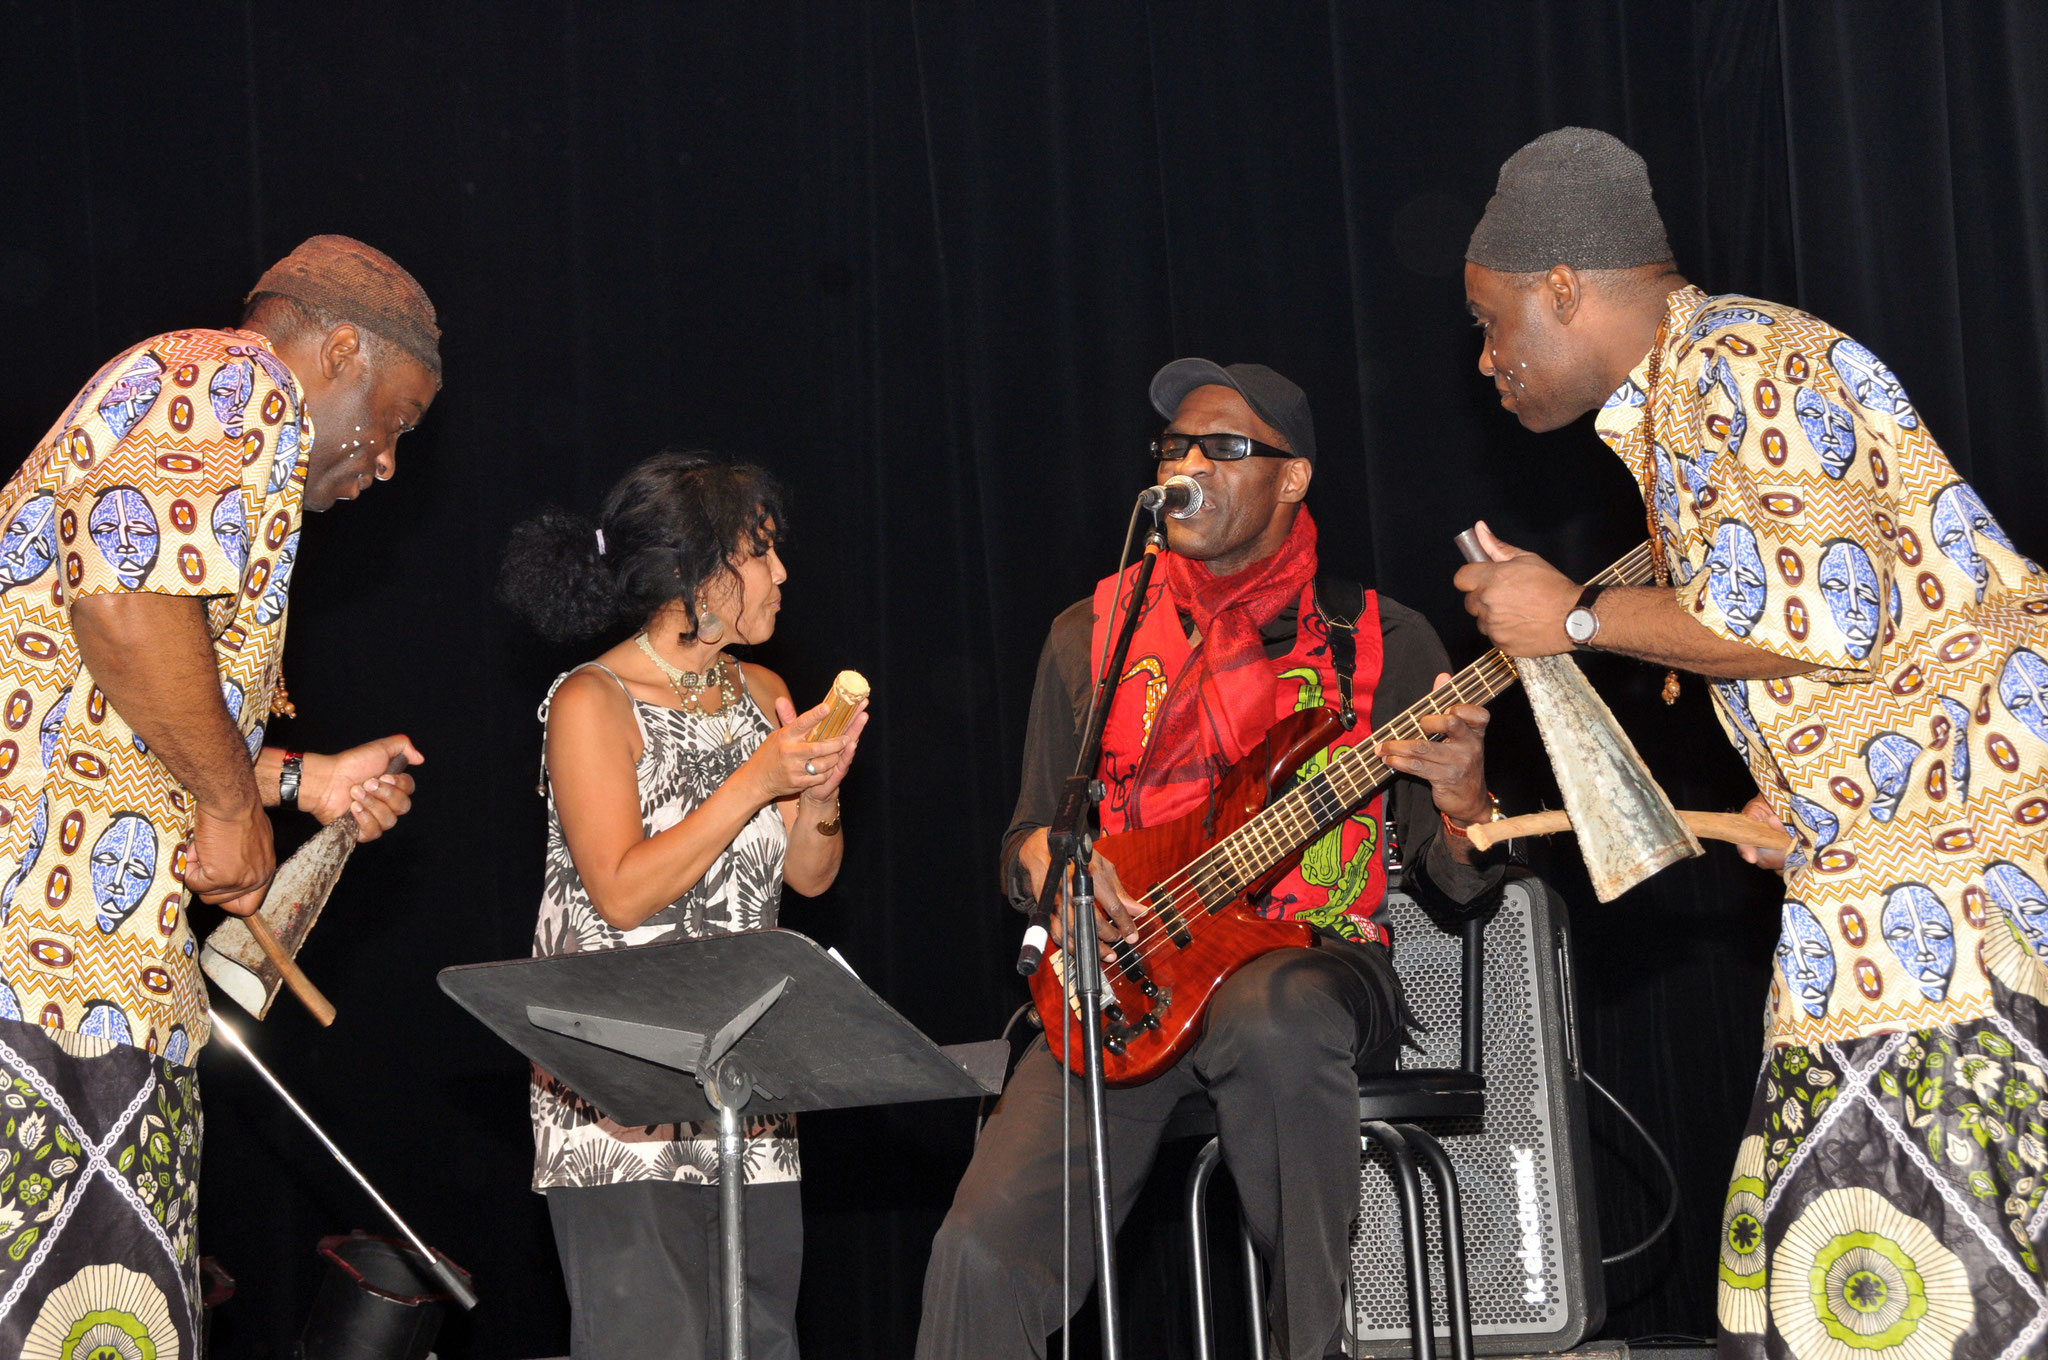 Les Jumeaux de MASAO (Masao Masu) with the singer Sha Rakotofiringa and the bass player Noël Ekwabiet.  Photo : Jean-Luc Karcher